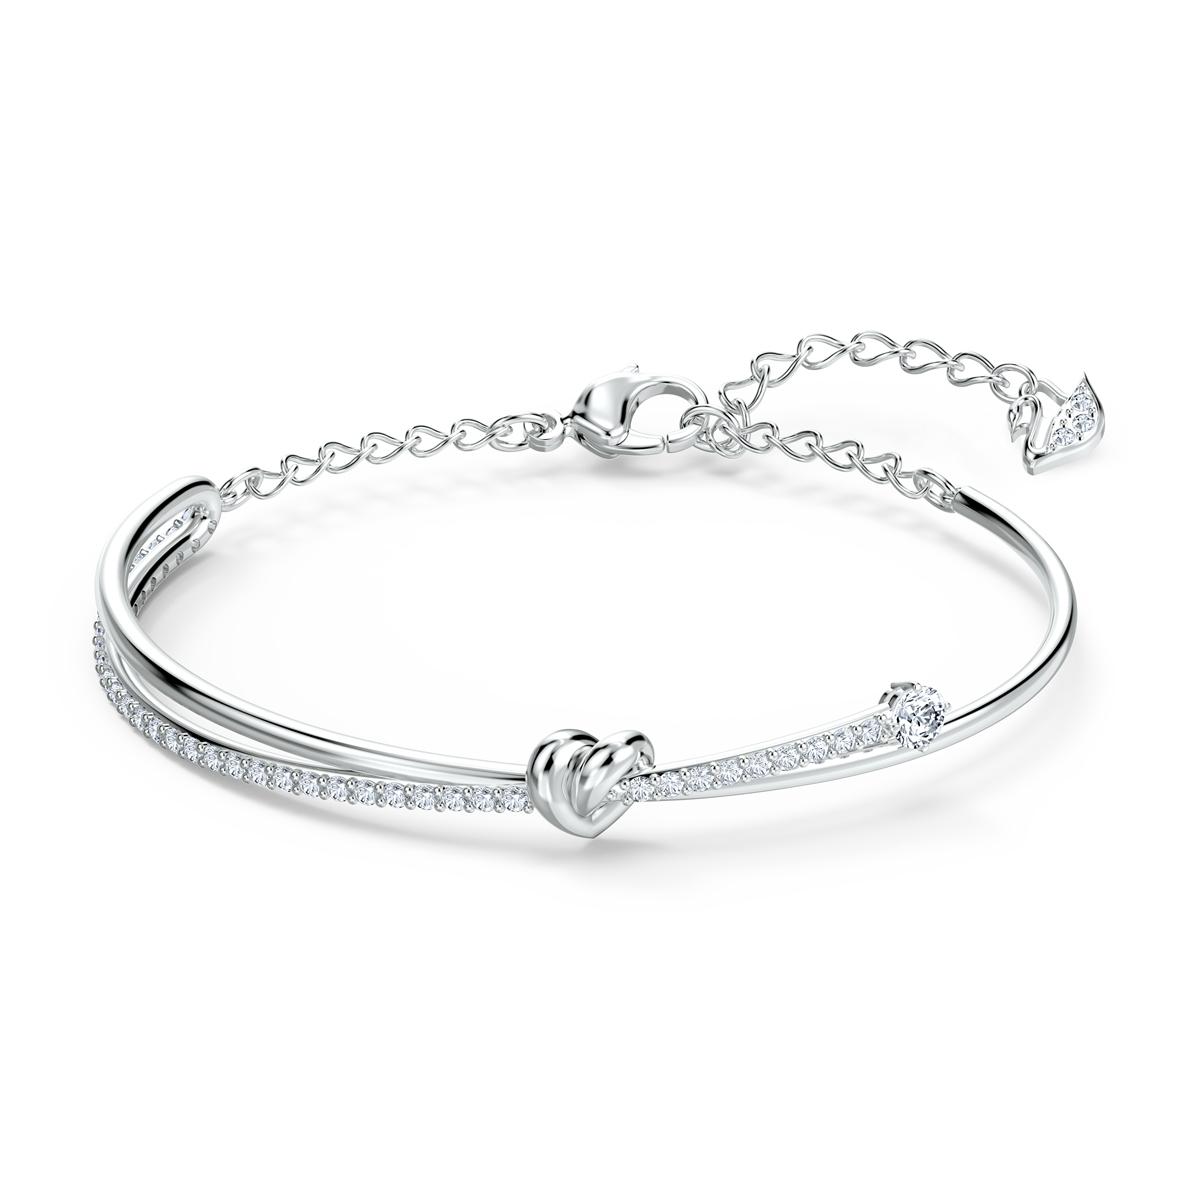 Swarovski Crystal and Rhodium Silver Lifelong Heart Bangle Bracelet